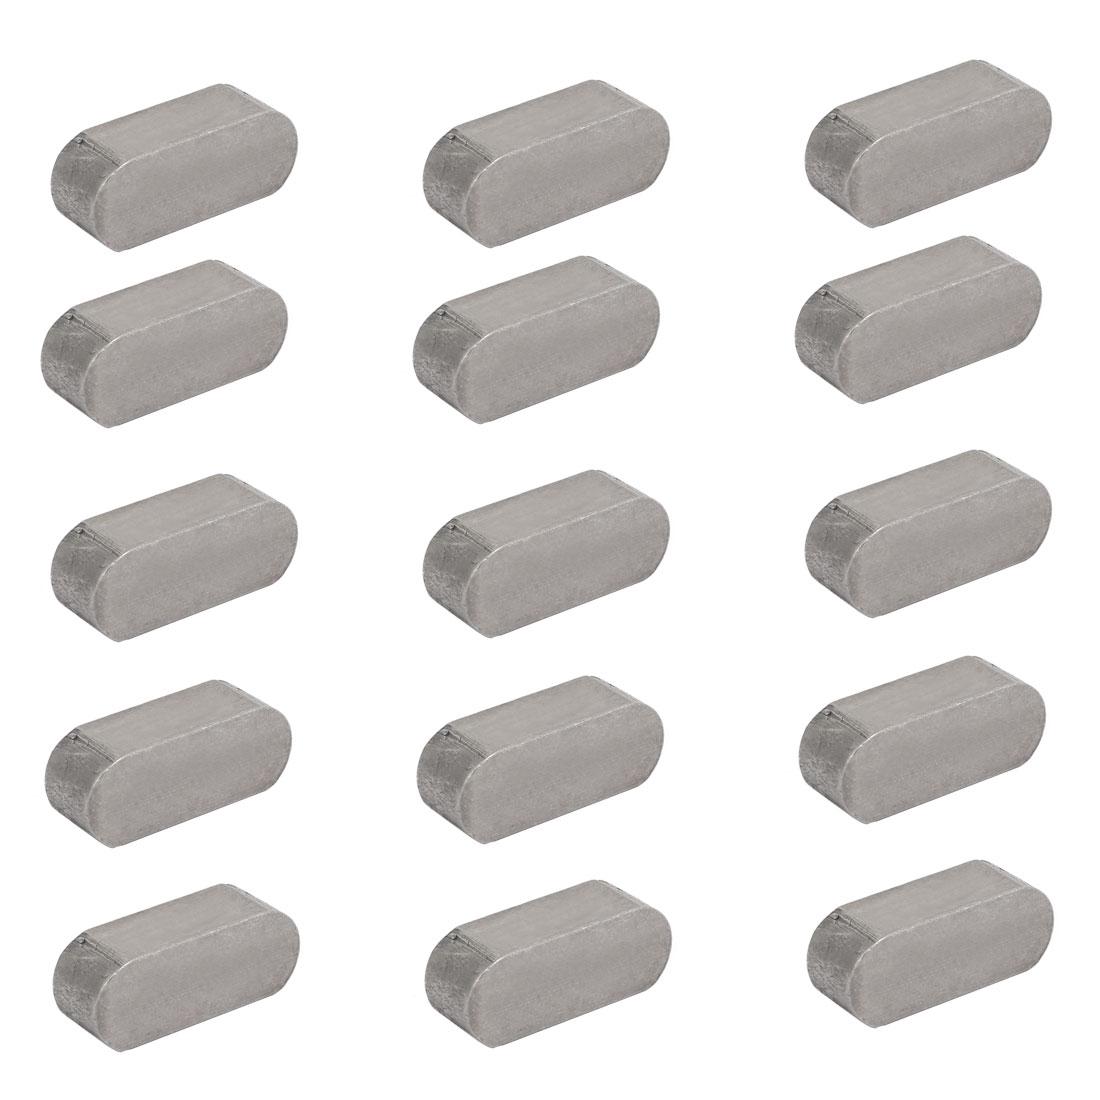 25mmx10mmx8mm Carbon Steel Key Stock To Lock Pulleys 15pcs